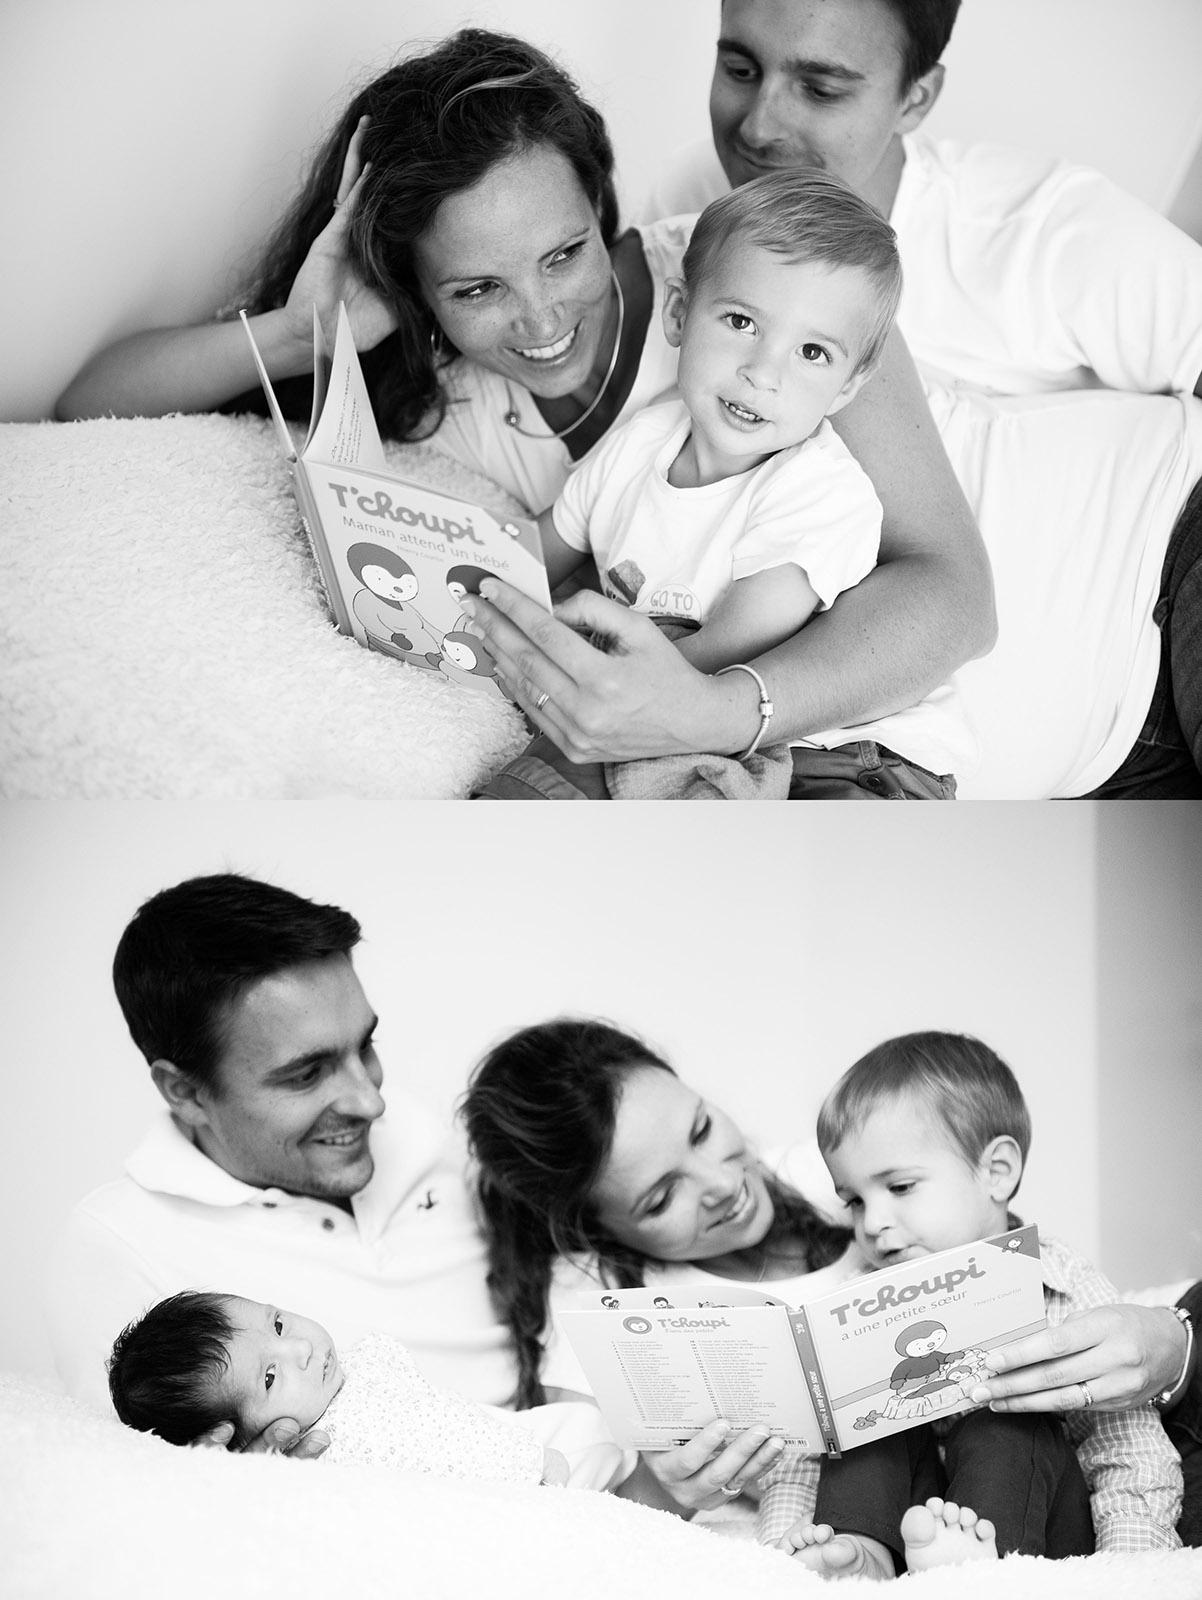 seance-photo-famille-photo-grossesse-photo-bébé-naissance-sabrina-godemert-photographe-seine-et-marne045